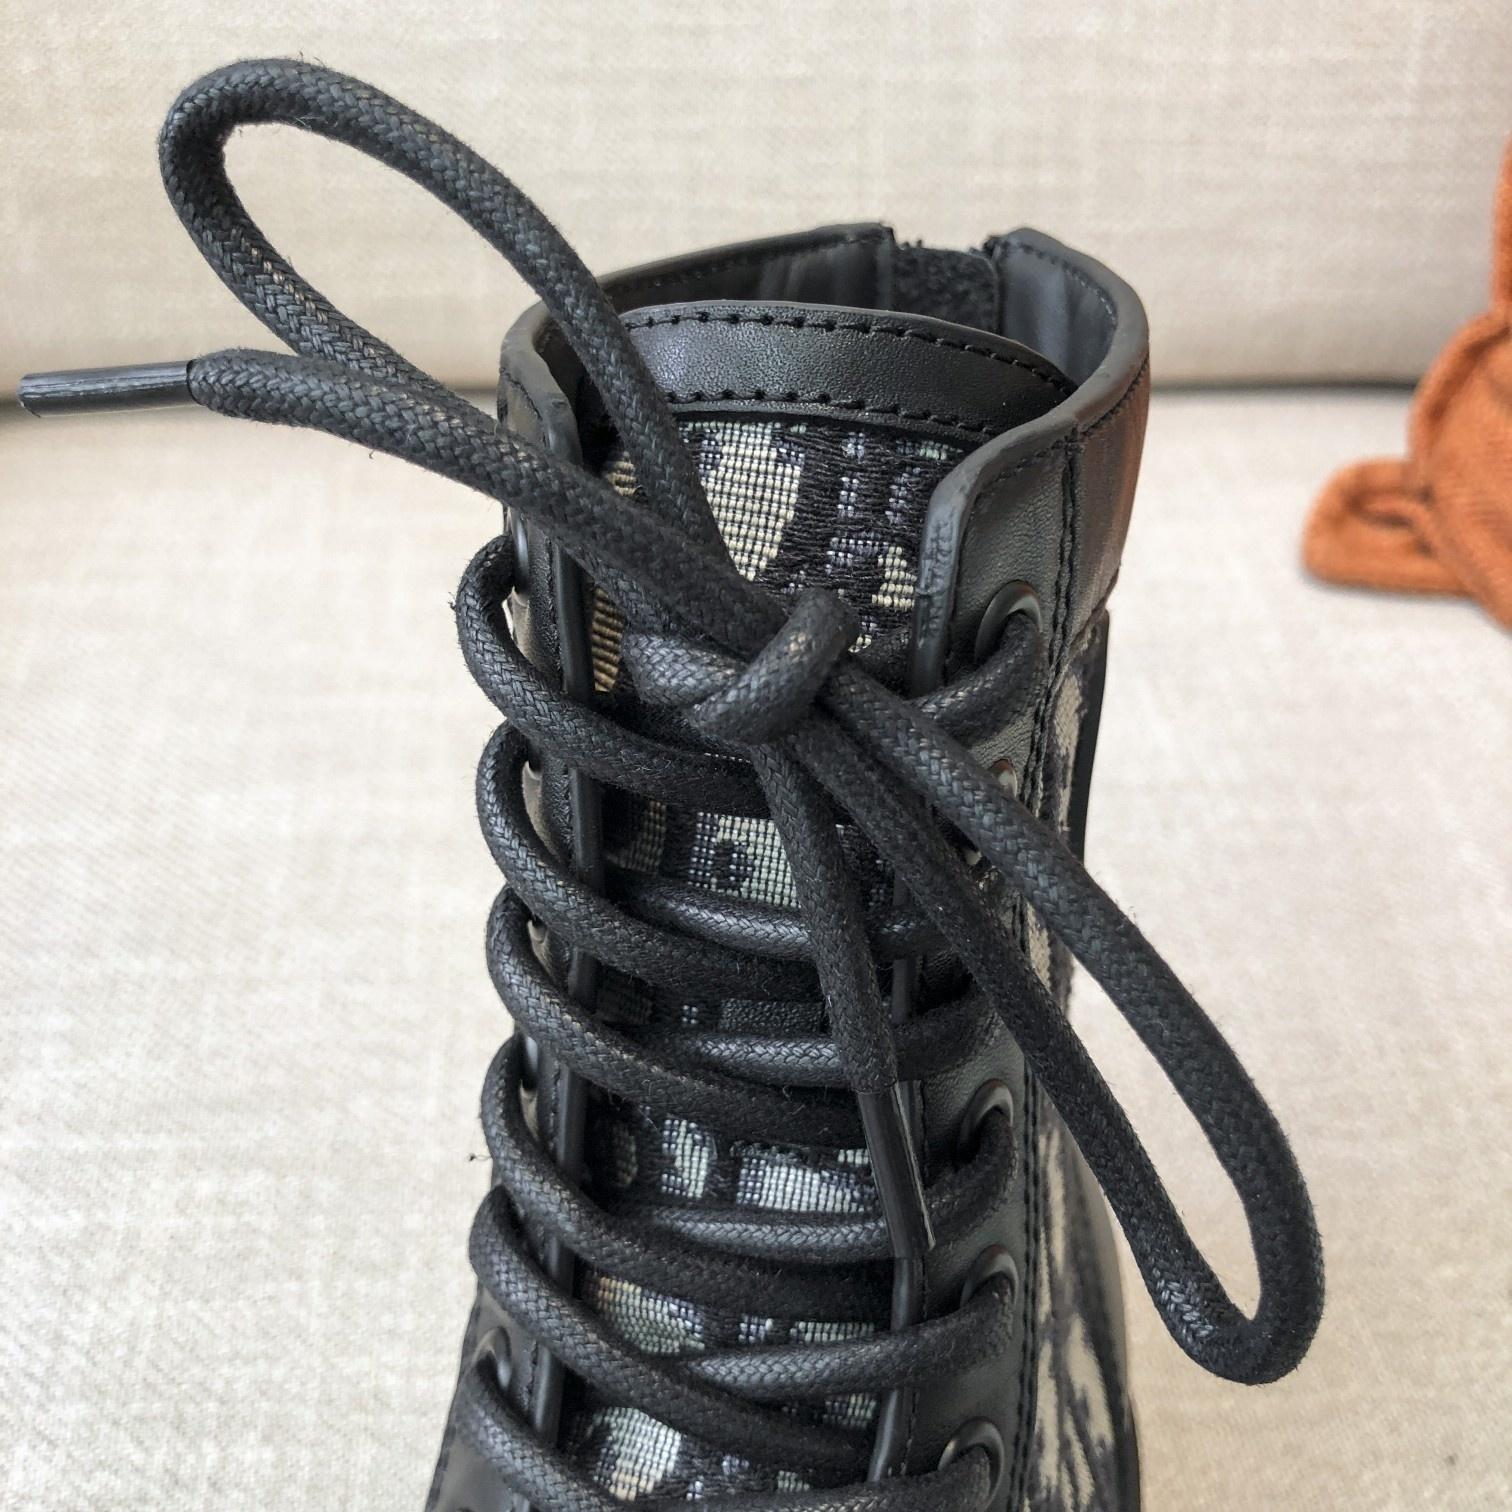 Dior高版本情侣 款2020ss秋冬新款字母厚底系带机车靴,秋冬T台走秀同款(图10)